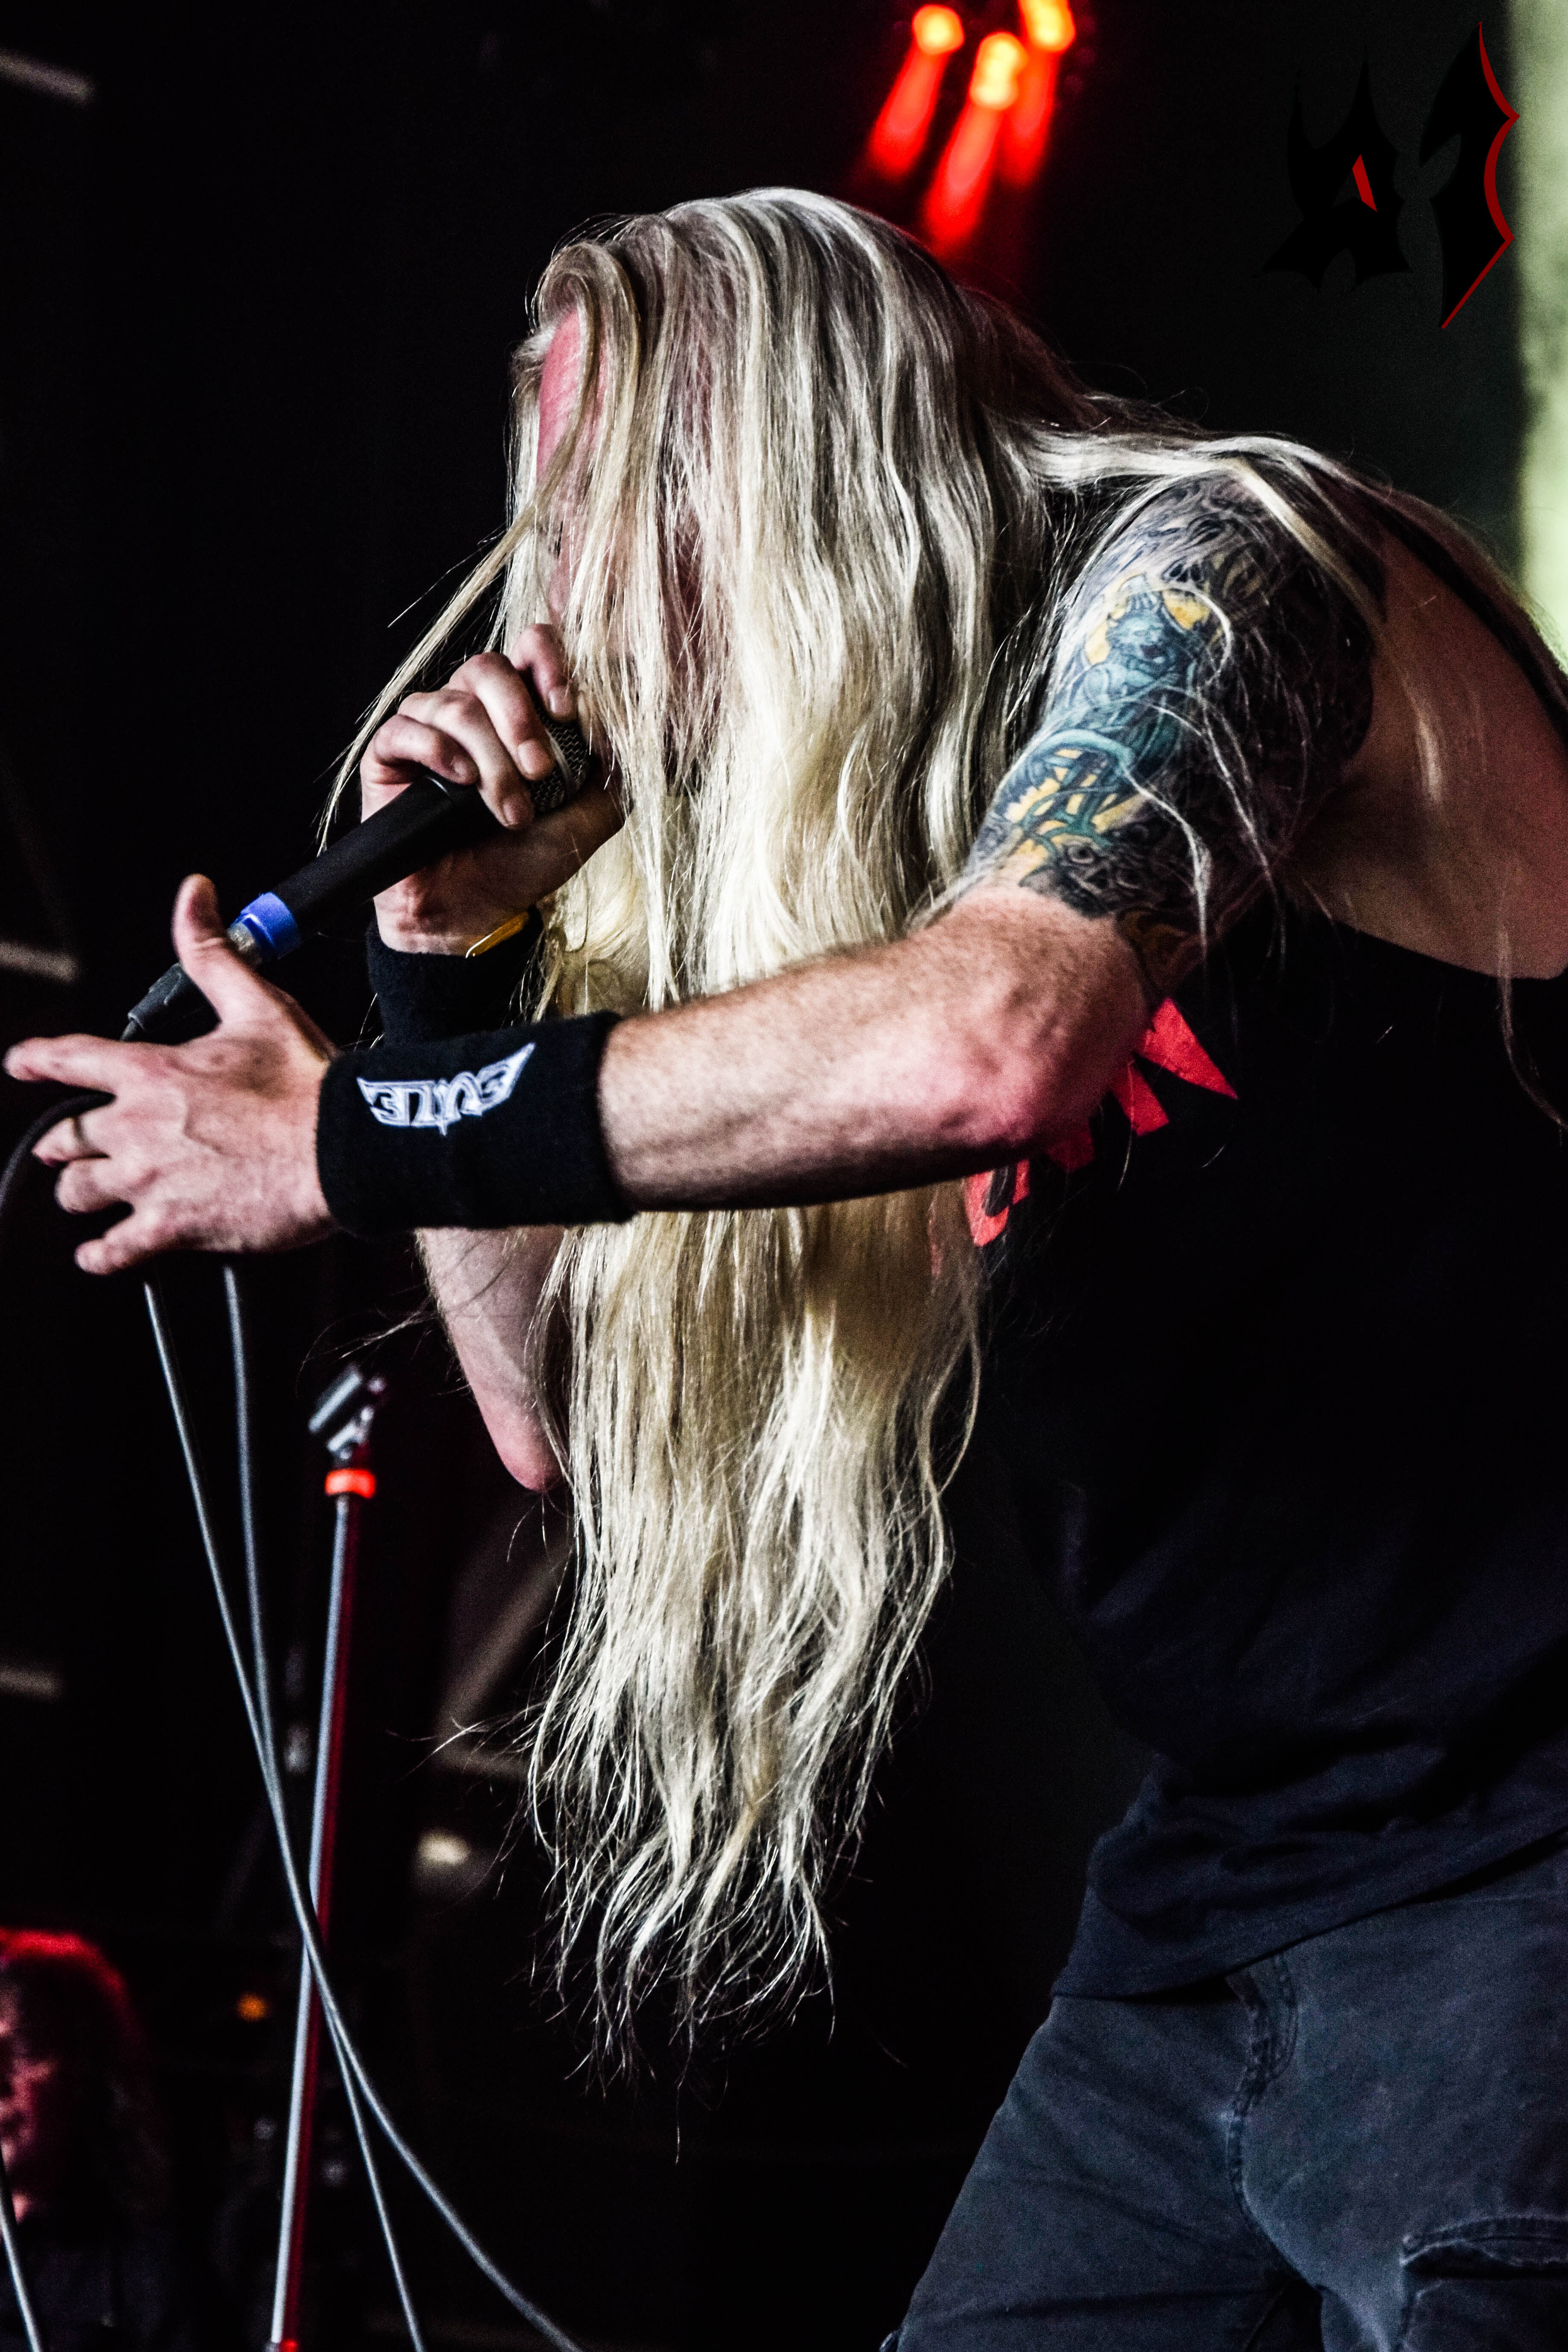 Hellfest - Jour 2 - Memoriam 11